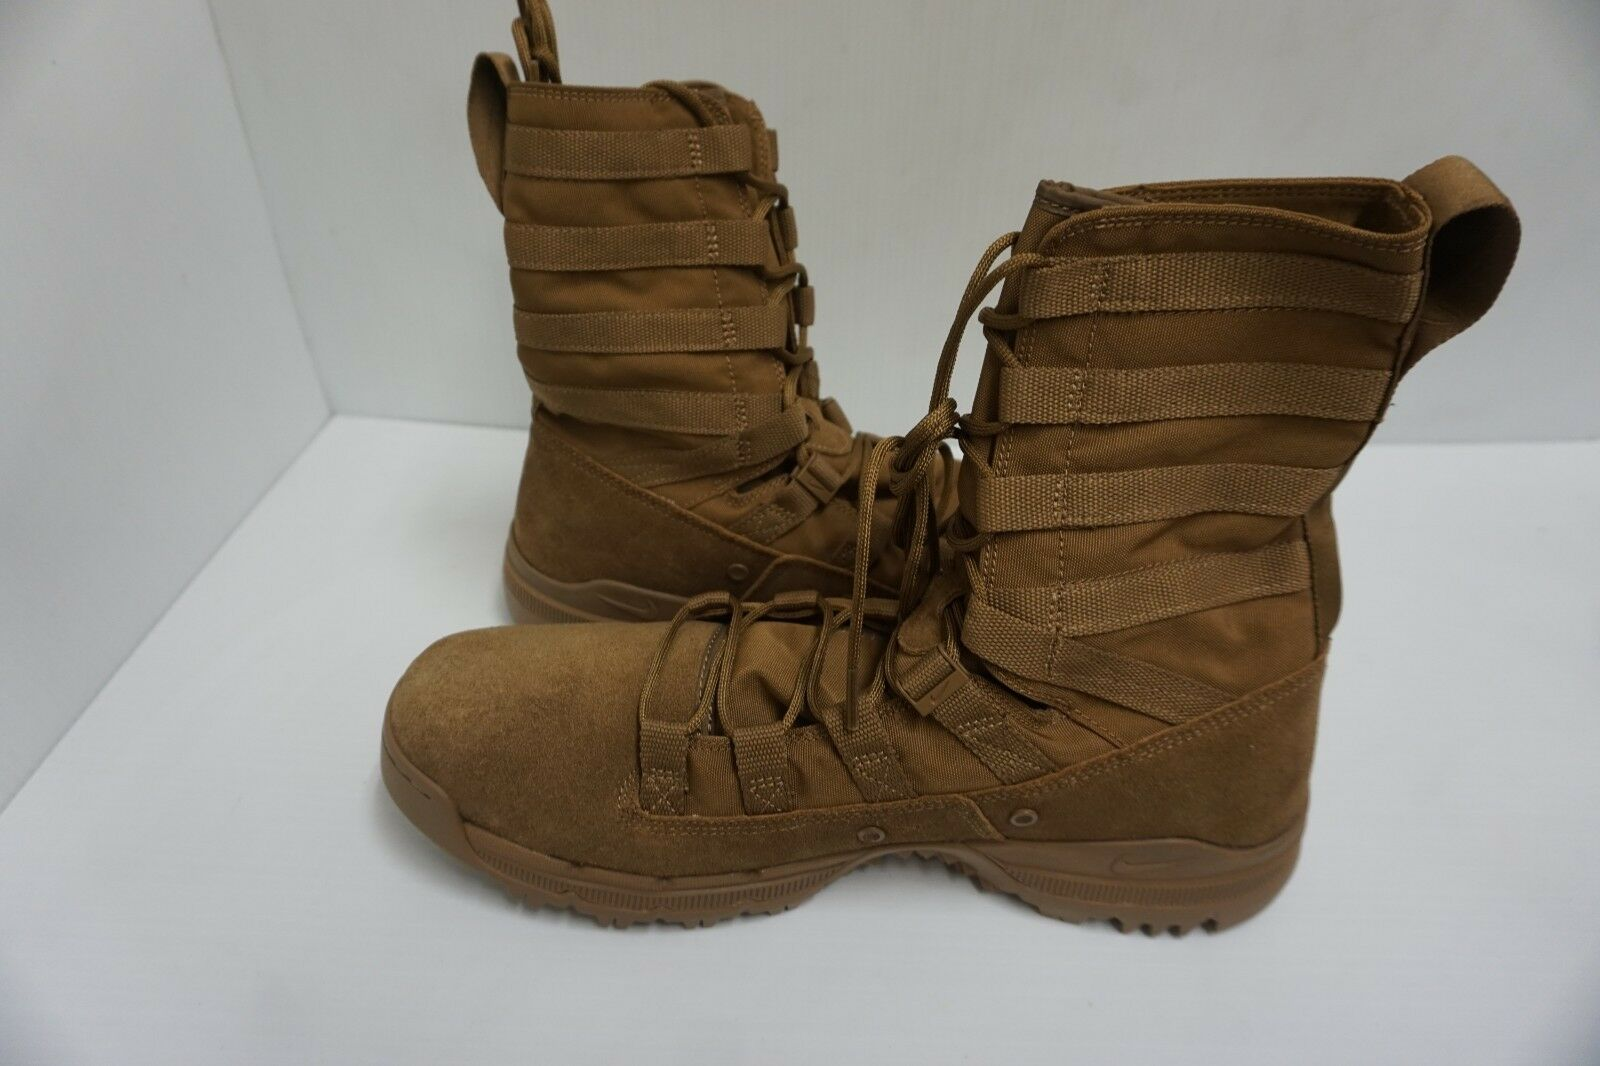 Nike SFB gen 2 8  leather Stiefel Größe 11.5 men new